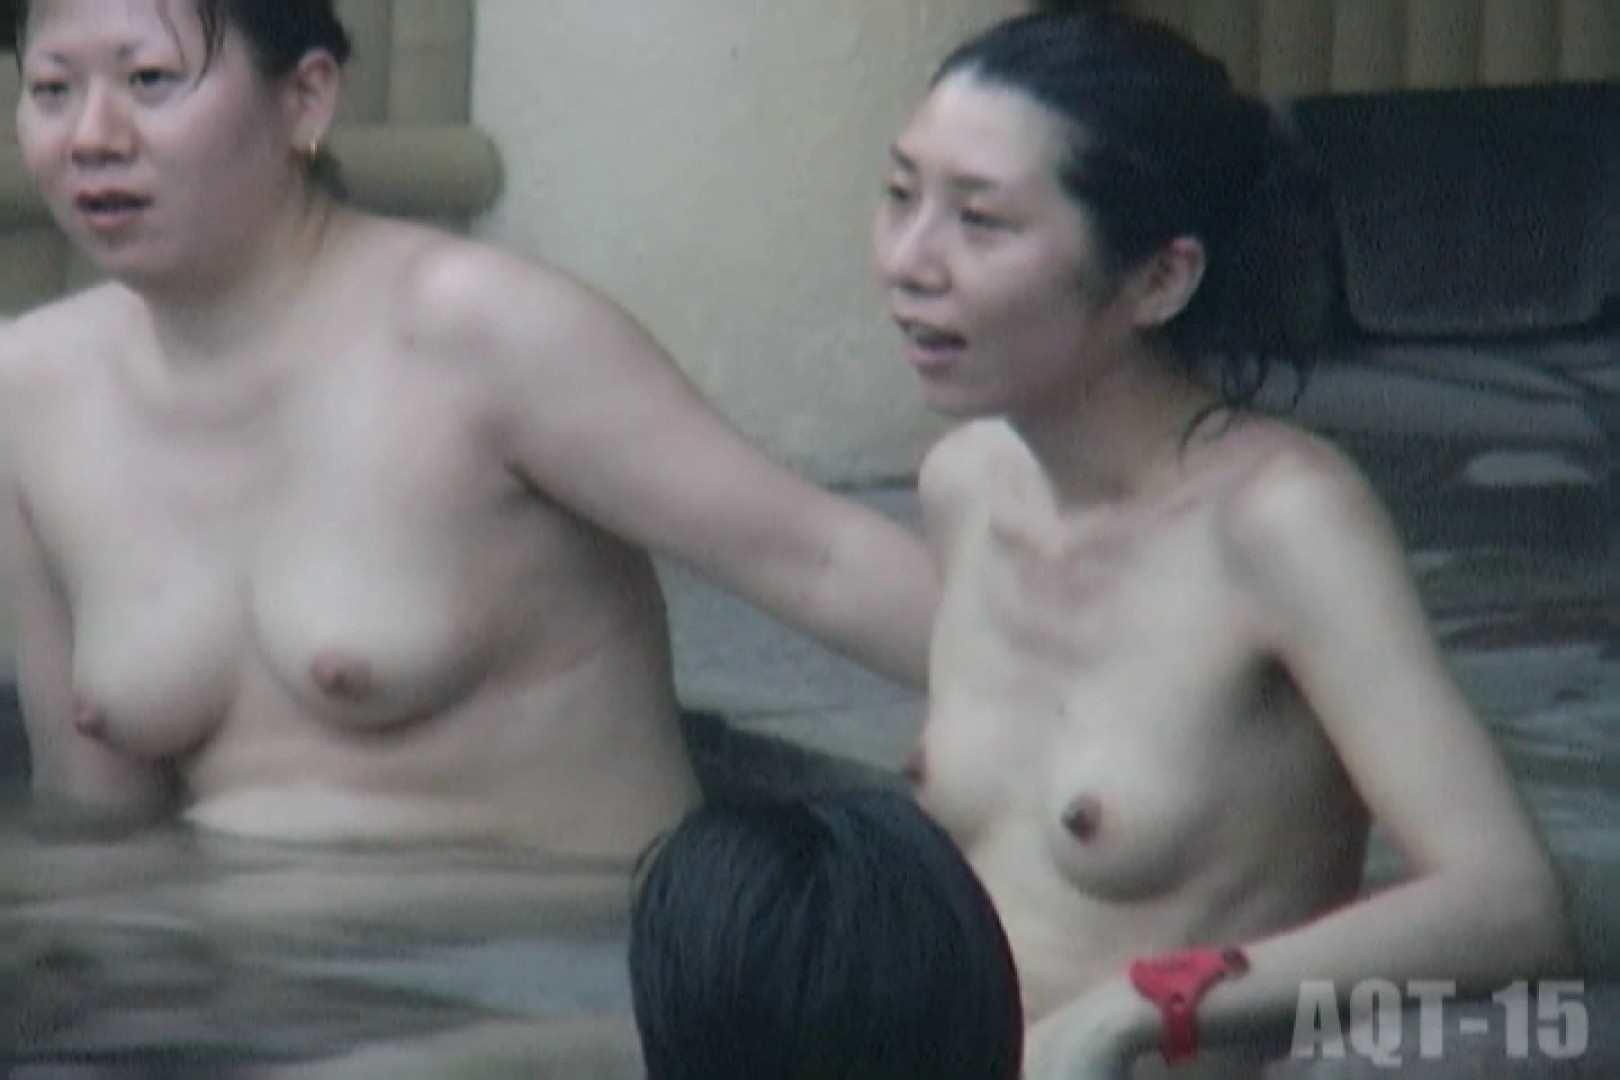 Aquaな露天風呂Vol.837 エッチな盗撮 エロ無料画像 103pic 33